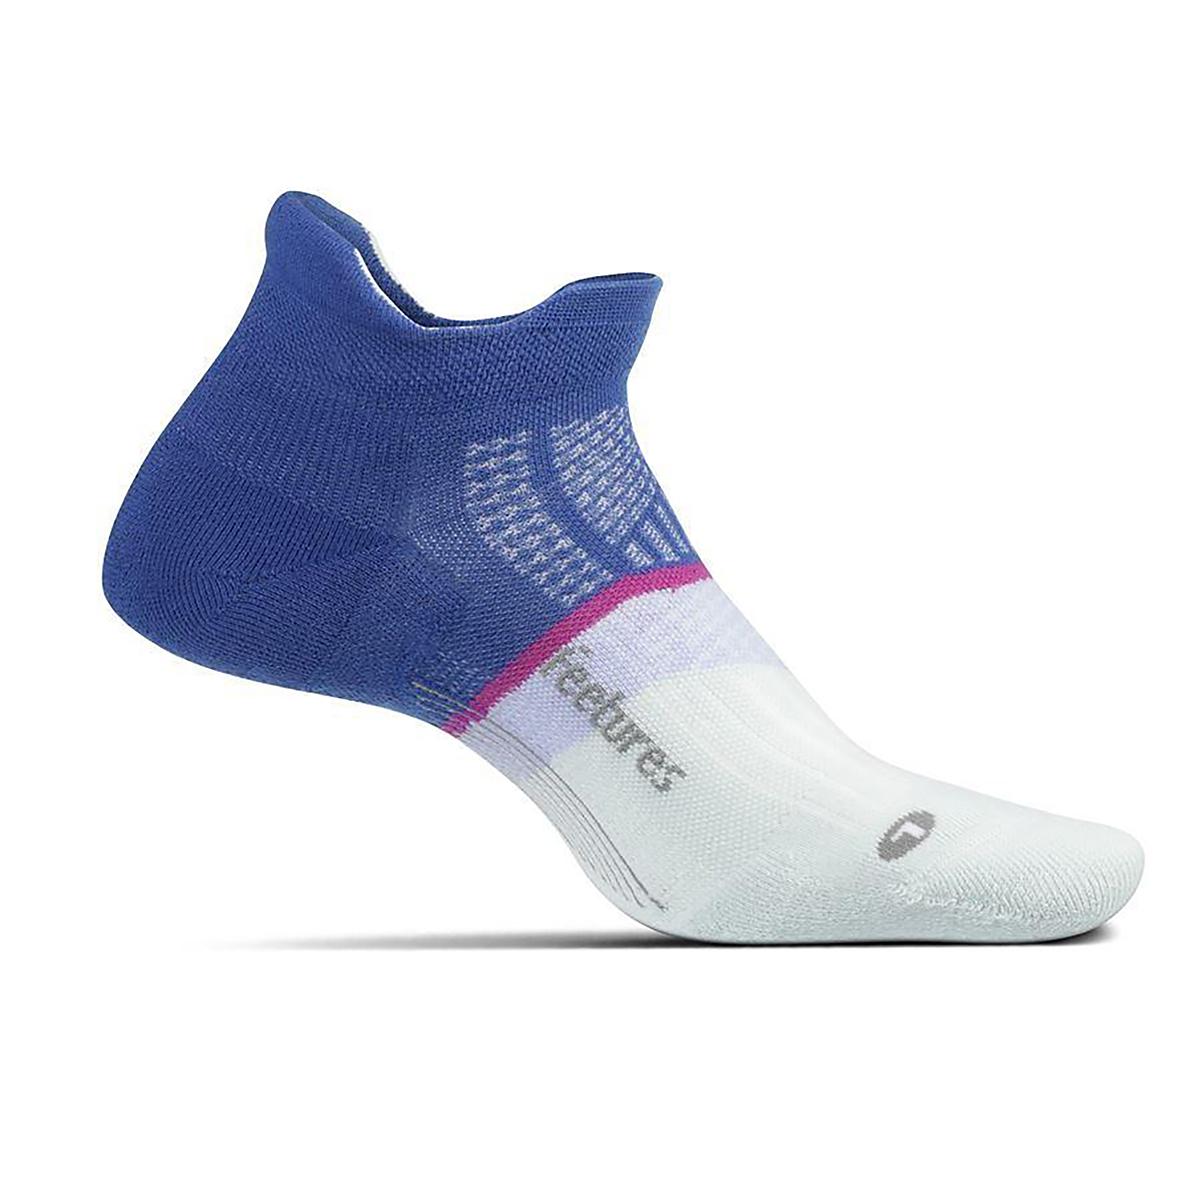 Feetures Elite Light Cushion No Show Tab Socks - Color: Blue Moon - Size: S, Blue Moon, large, image 1